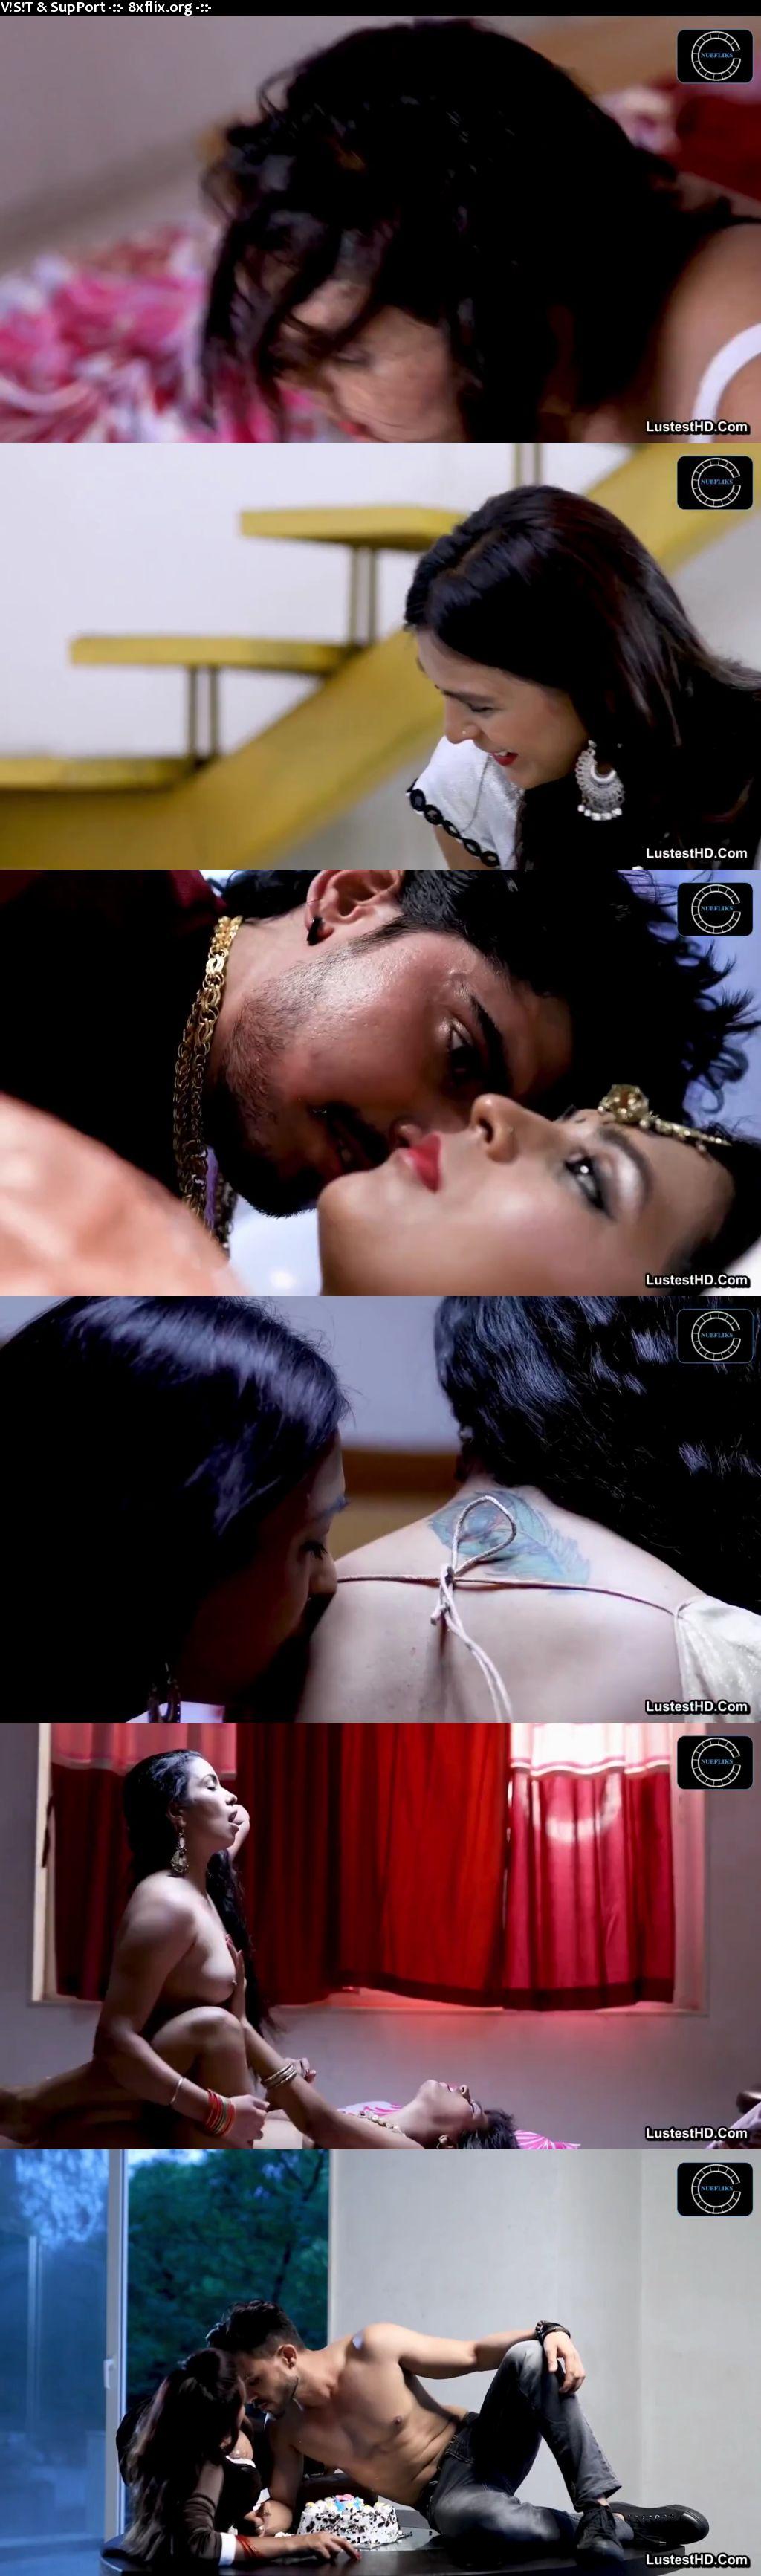 18+ Pyaas 2020 Full Hindi HOT Movie Download 720p HDRip